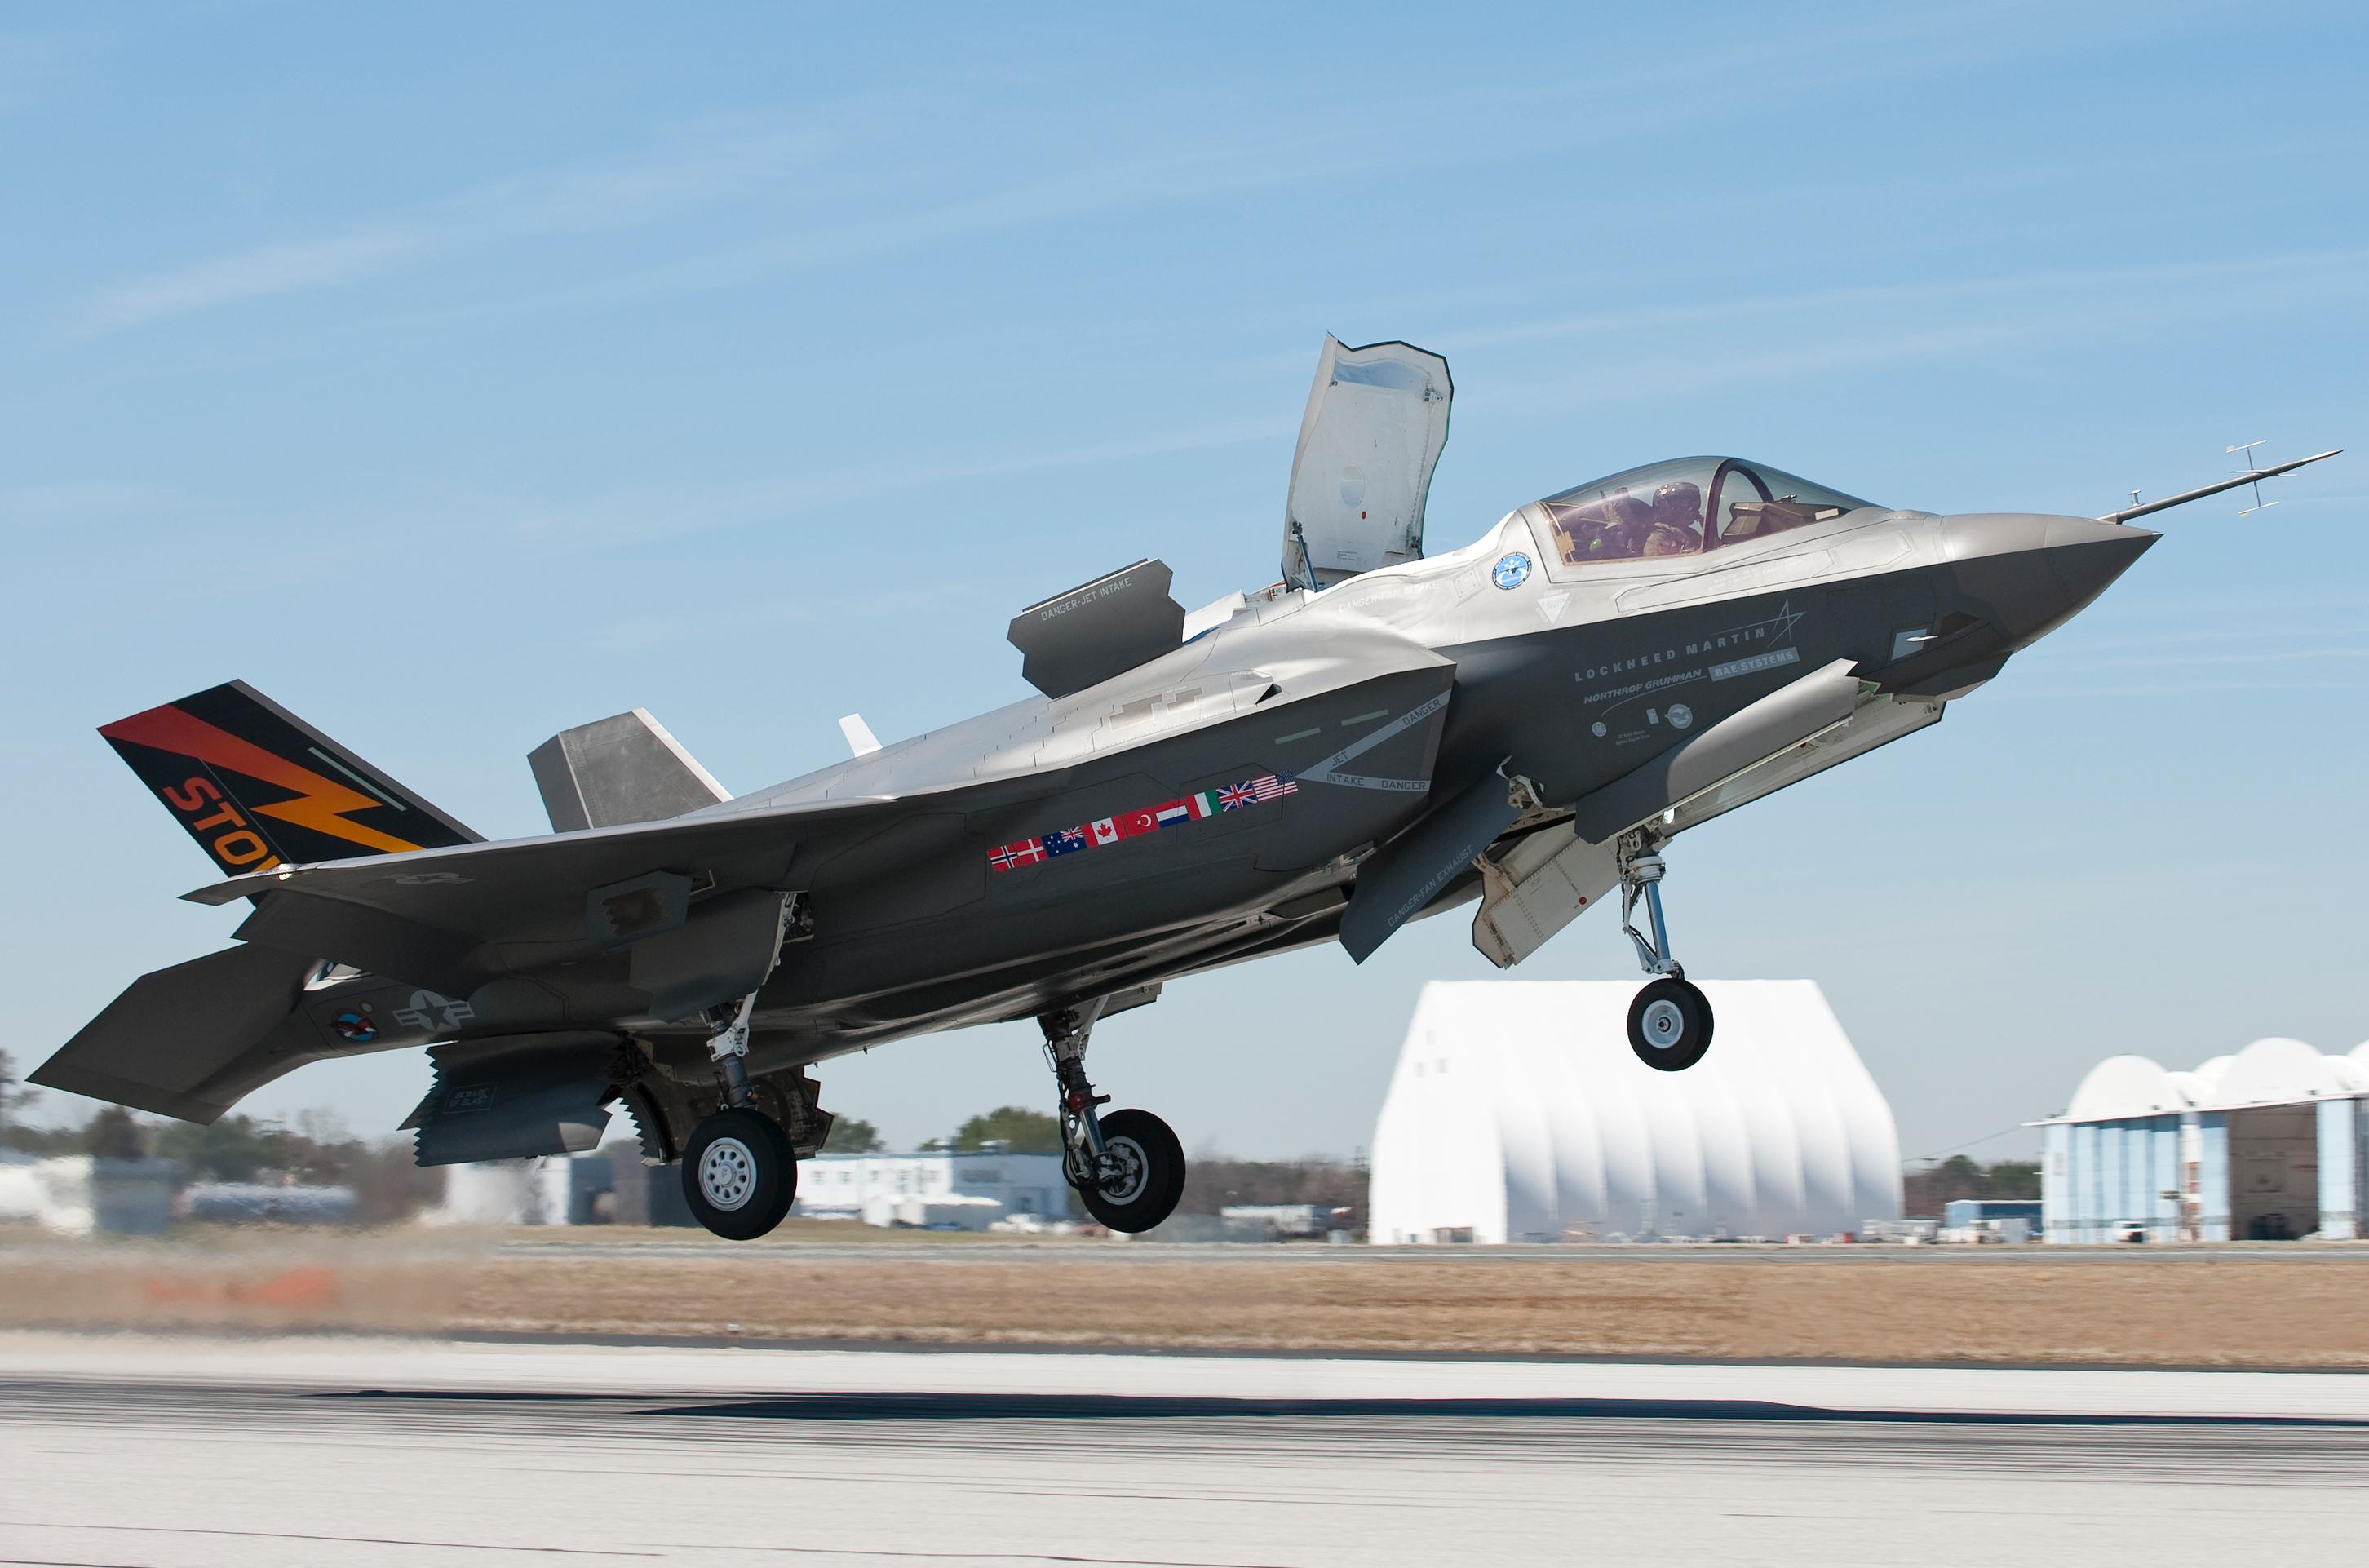 t50/pak fa  ليست شبحيه حتى الان بالتحليل والصور والمصادر  - صفحة 2 F-35_JSF_4